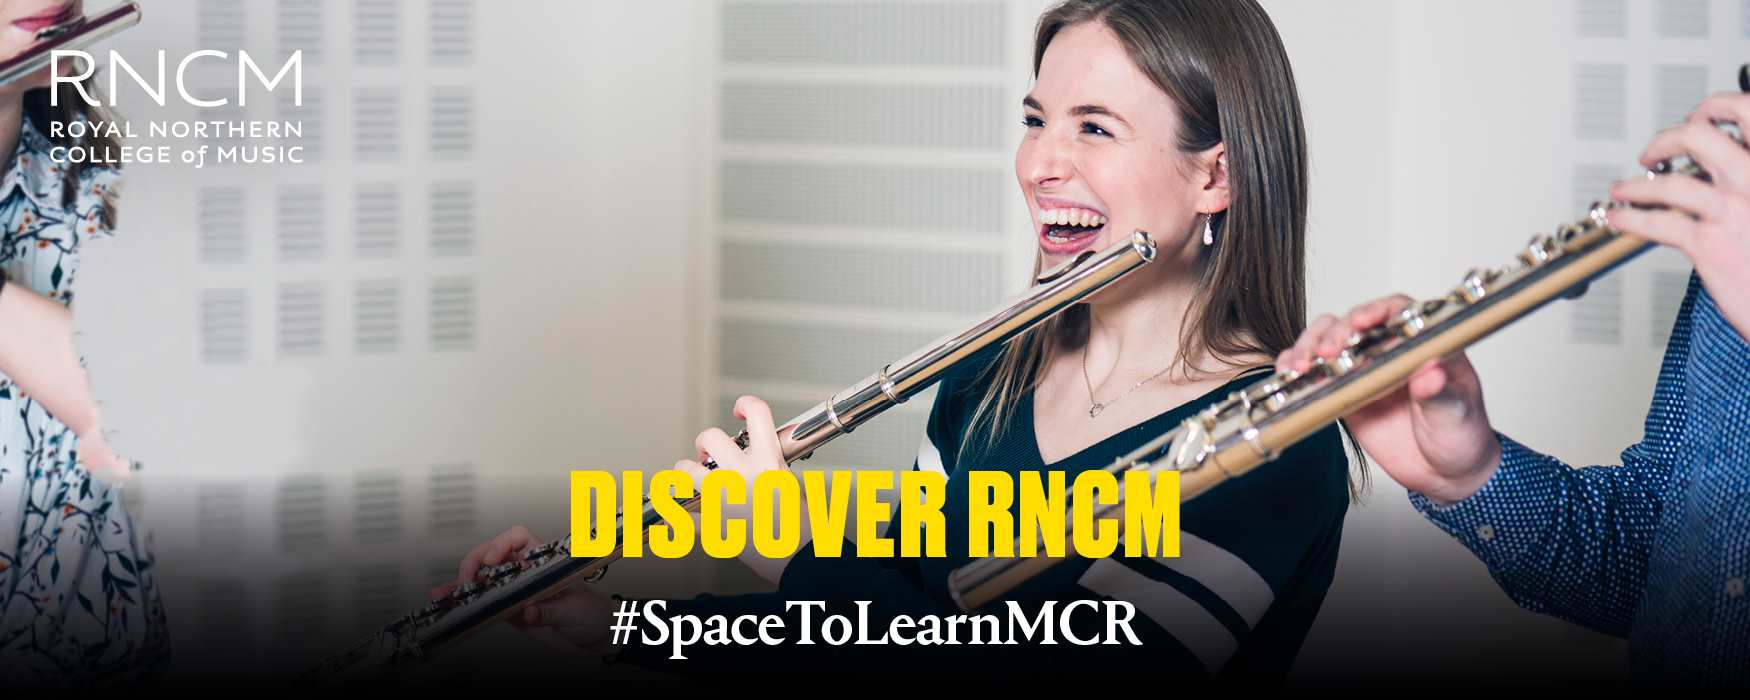 RNCM Promotion Banner